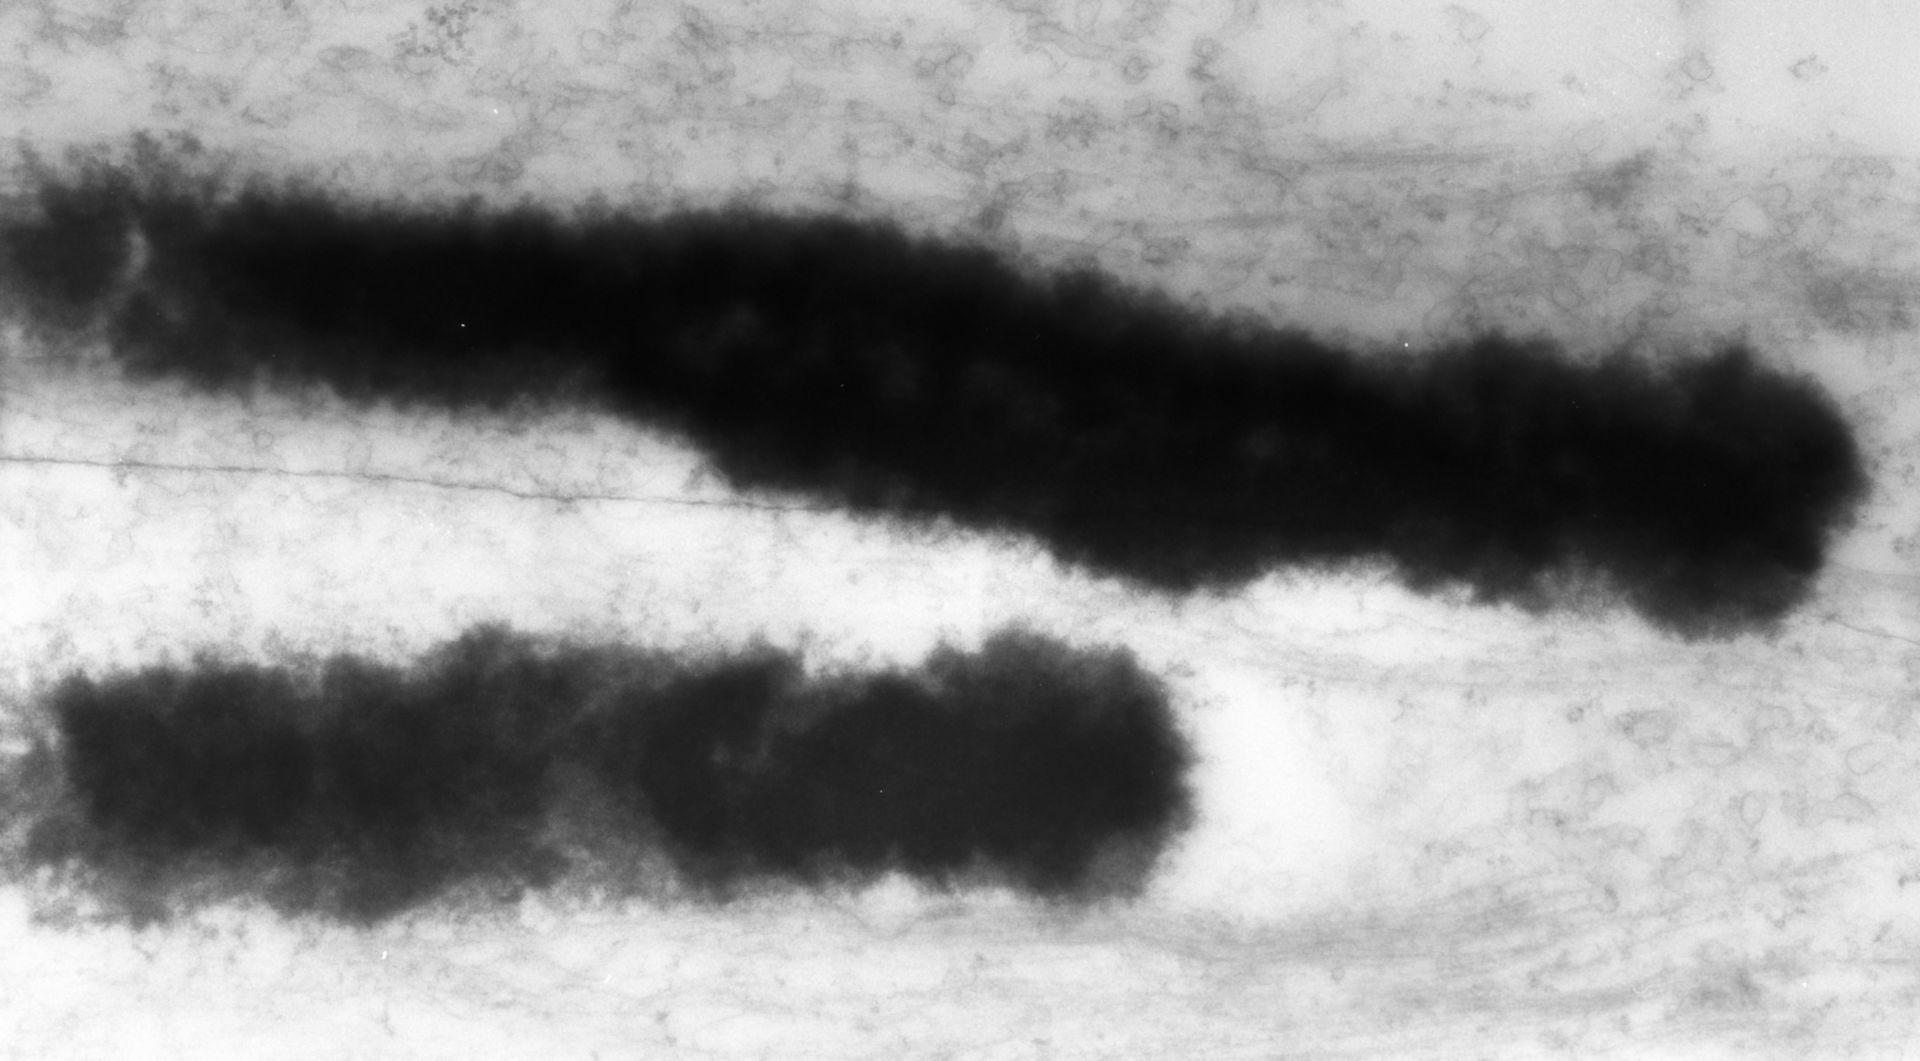 Haemanthus katharinae (Nuclear chromosome) - CIL:11916